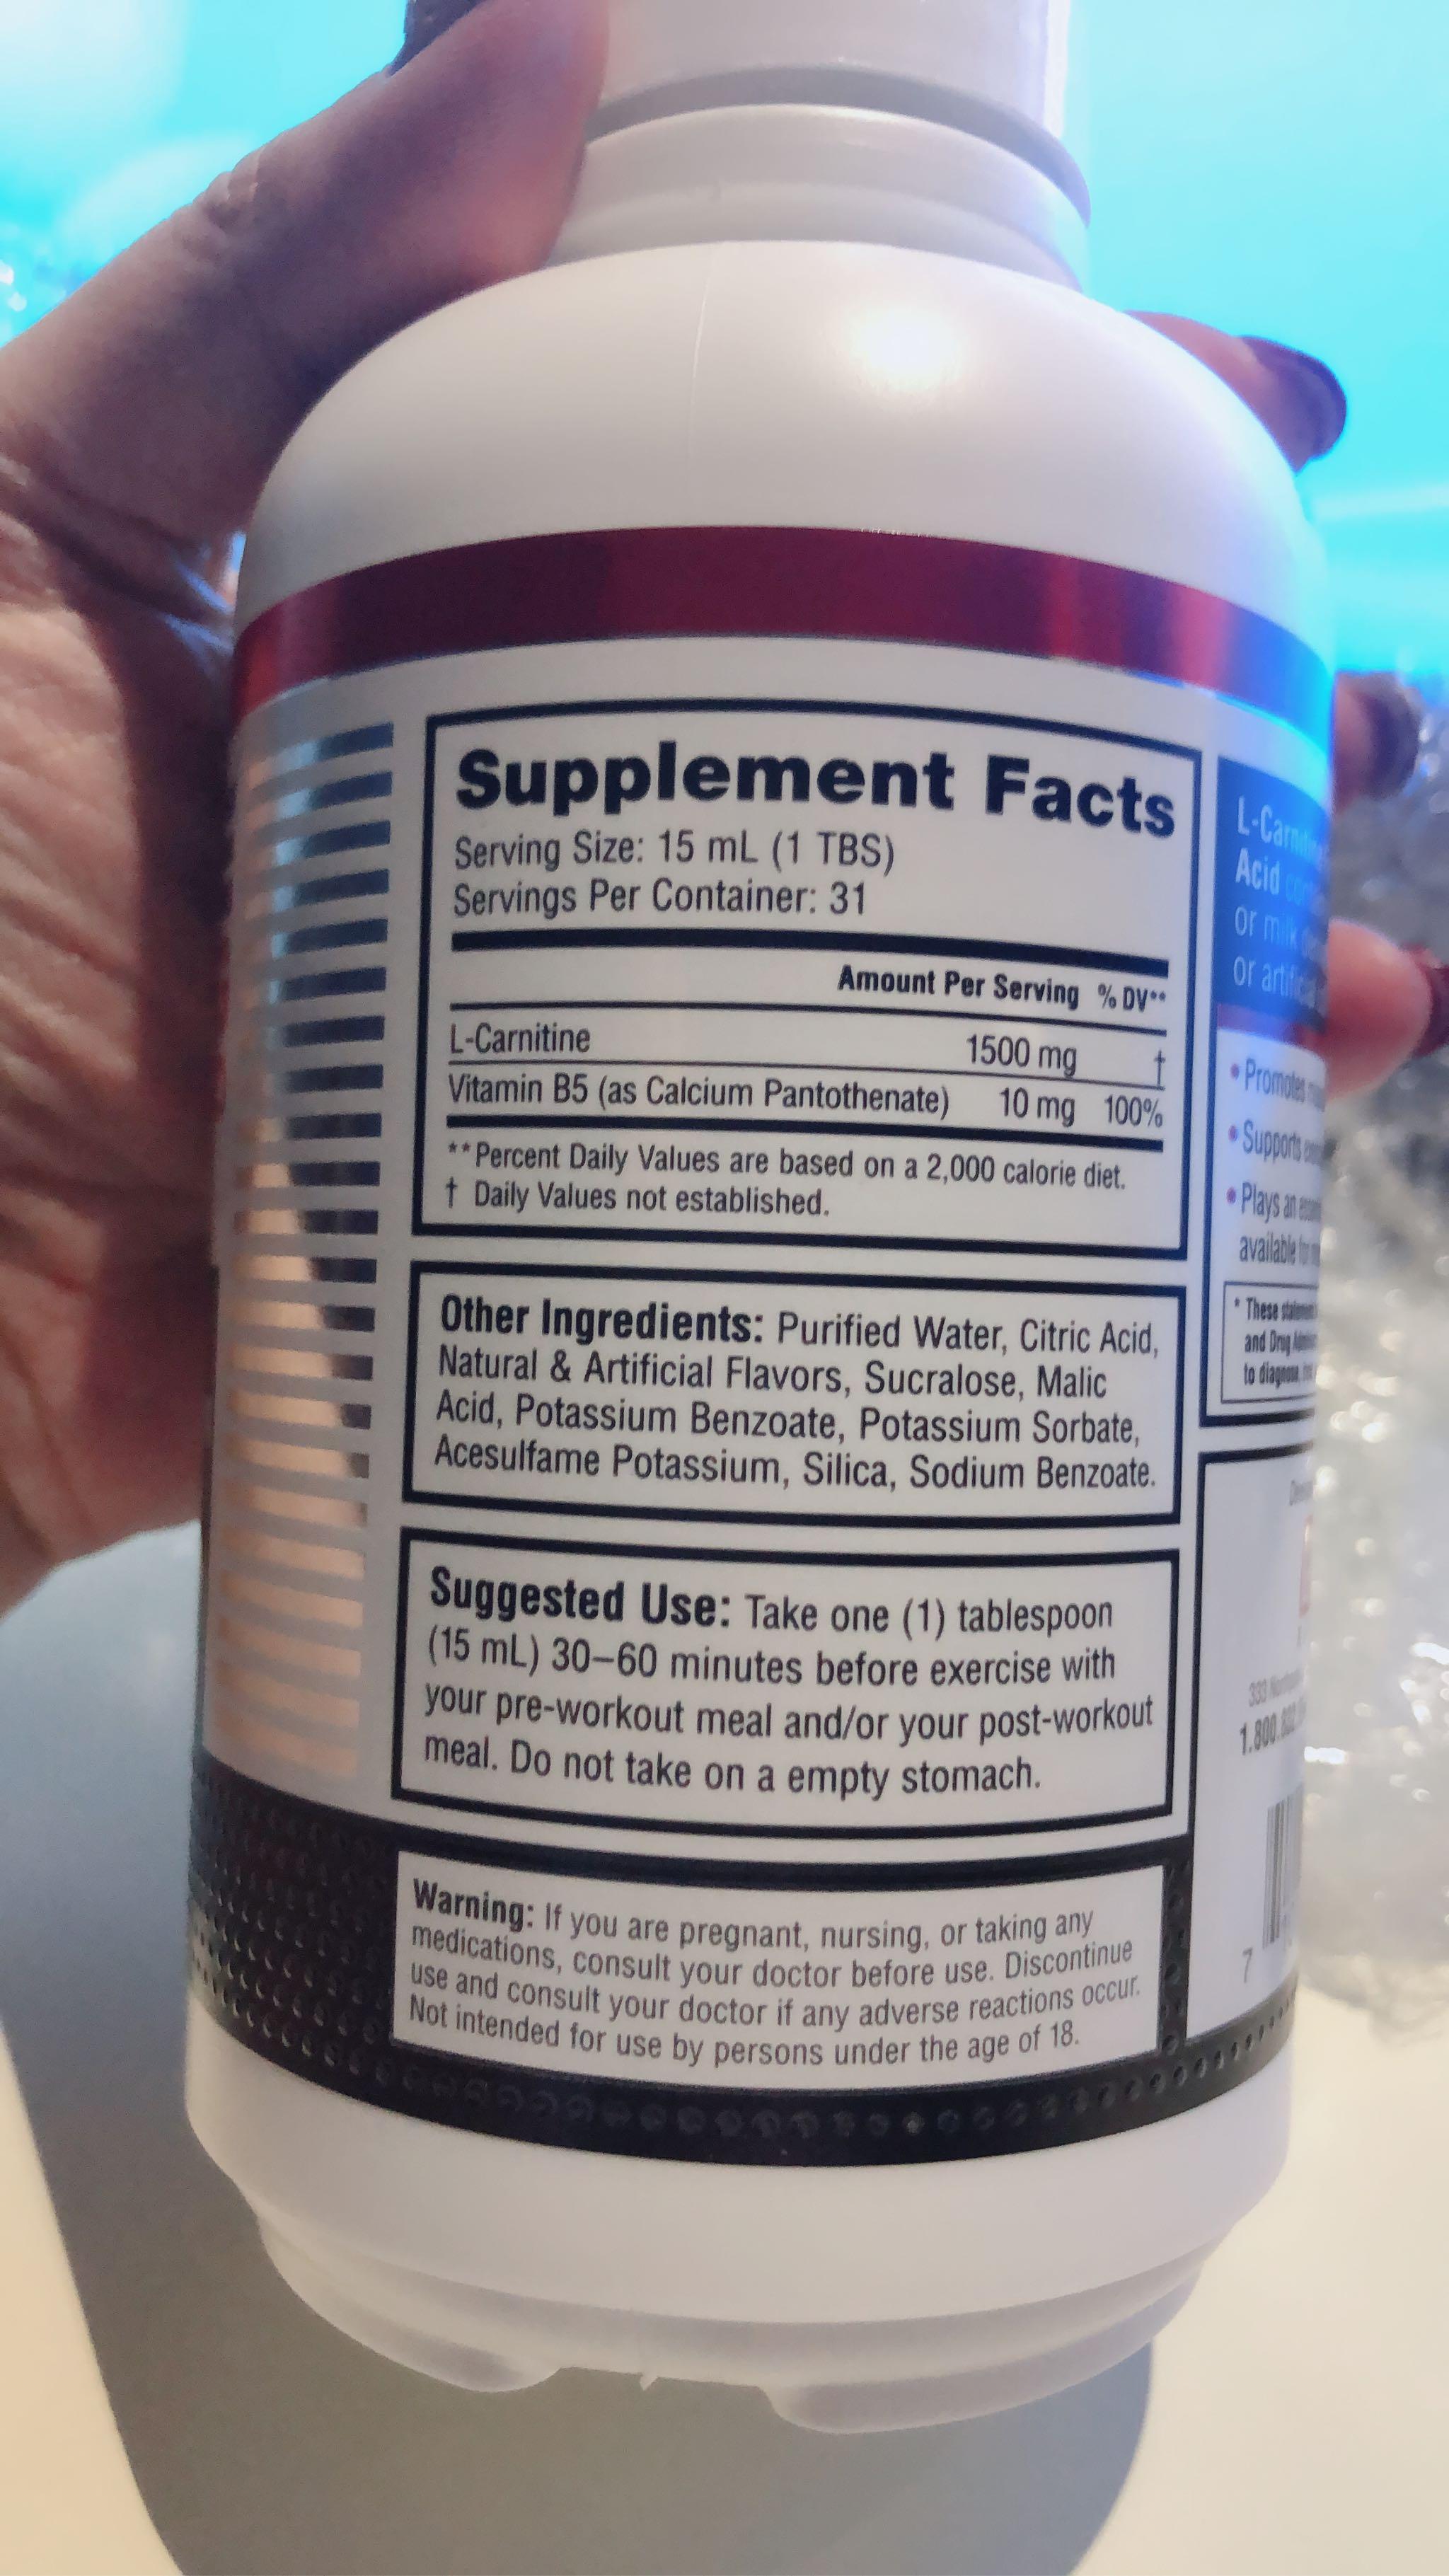 Labrada液体左旋肉碱试用体会,进口的应该安全